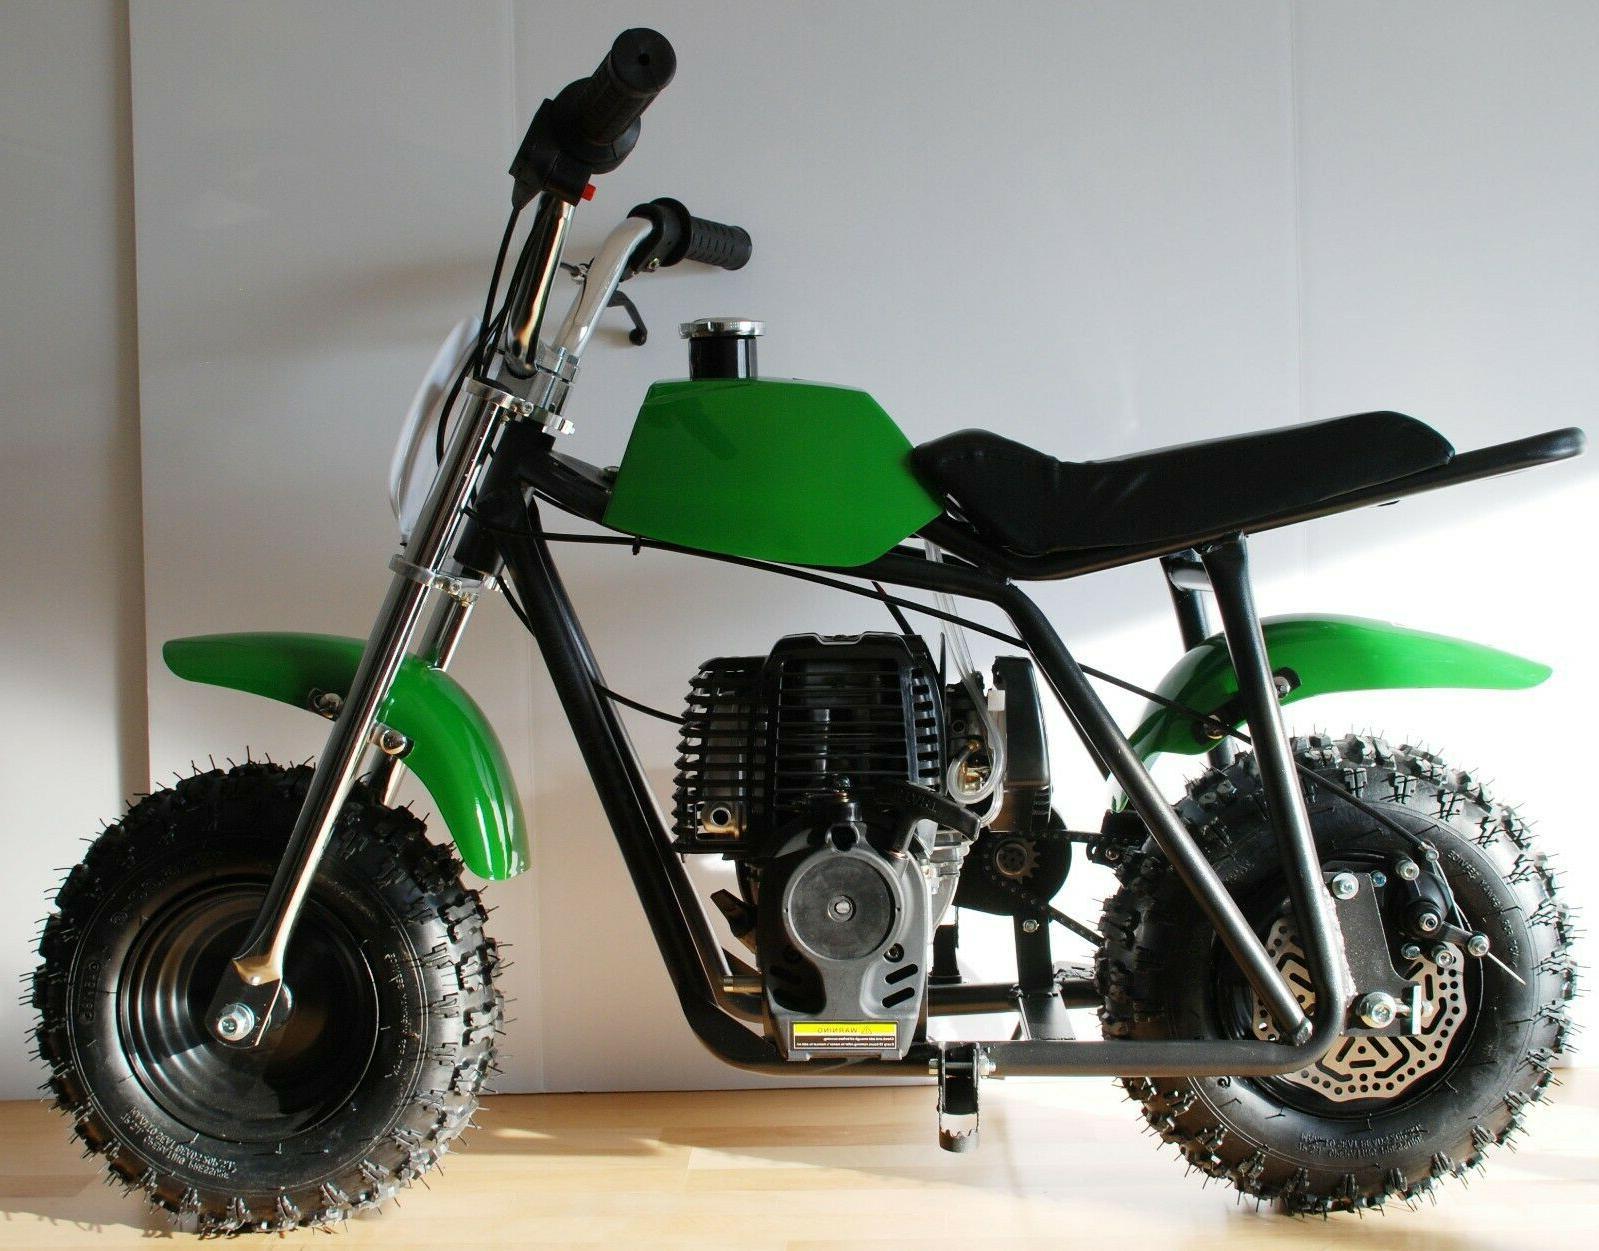 40cc Gas Bike - - old retro